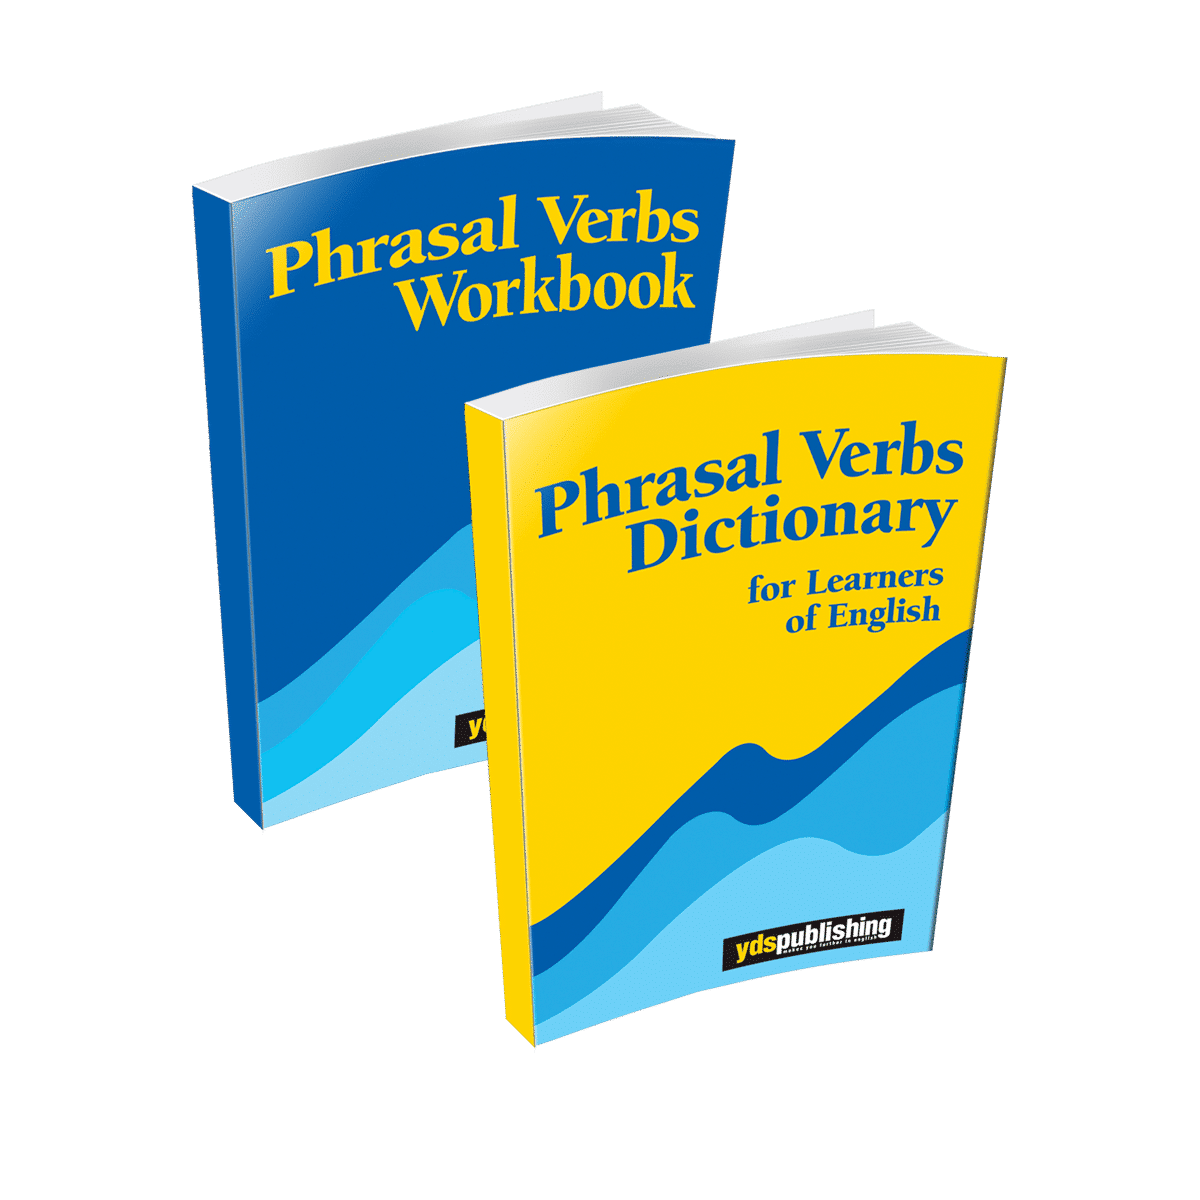 Phrasal Verb Dictionary phrasal verb dictionary Phrasal Verb Dictionary pharasal verb 001 min 1200x1200